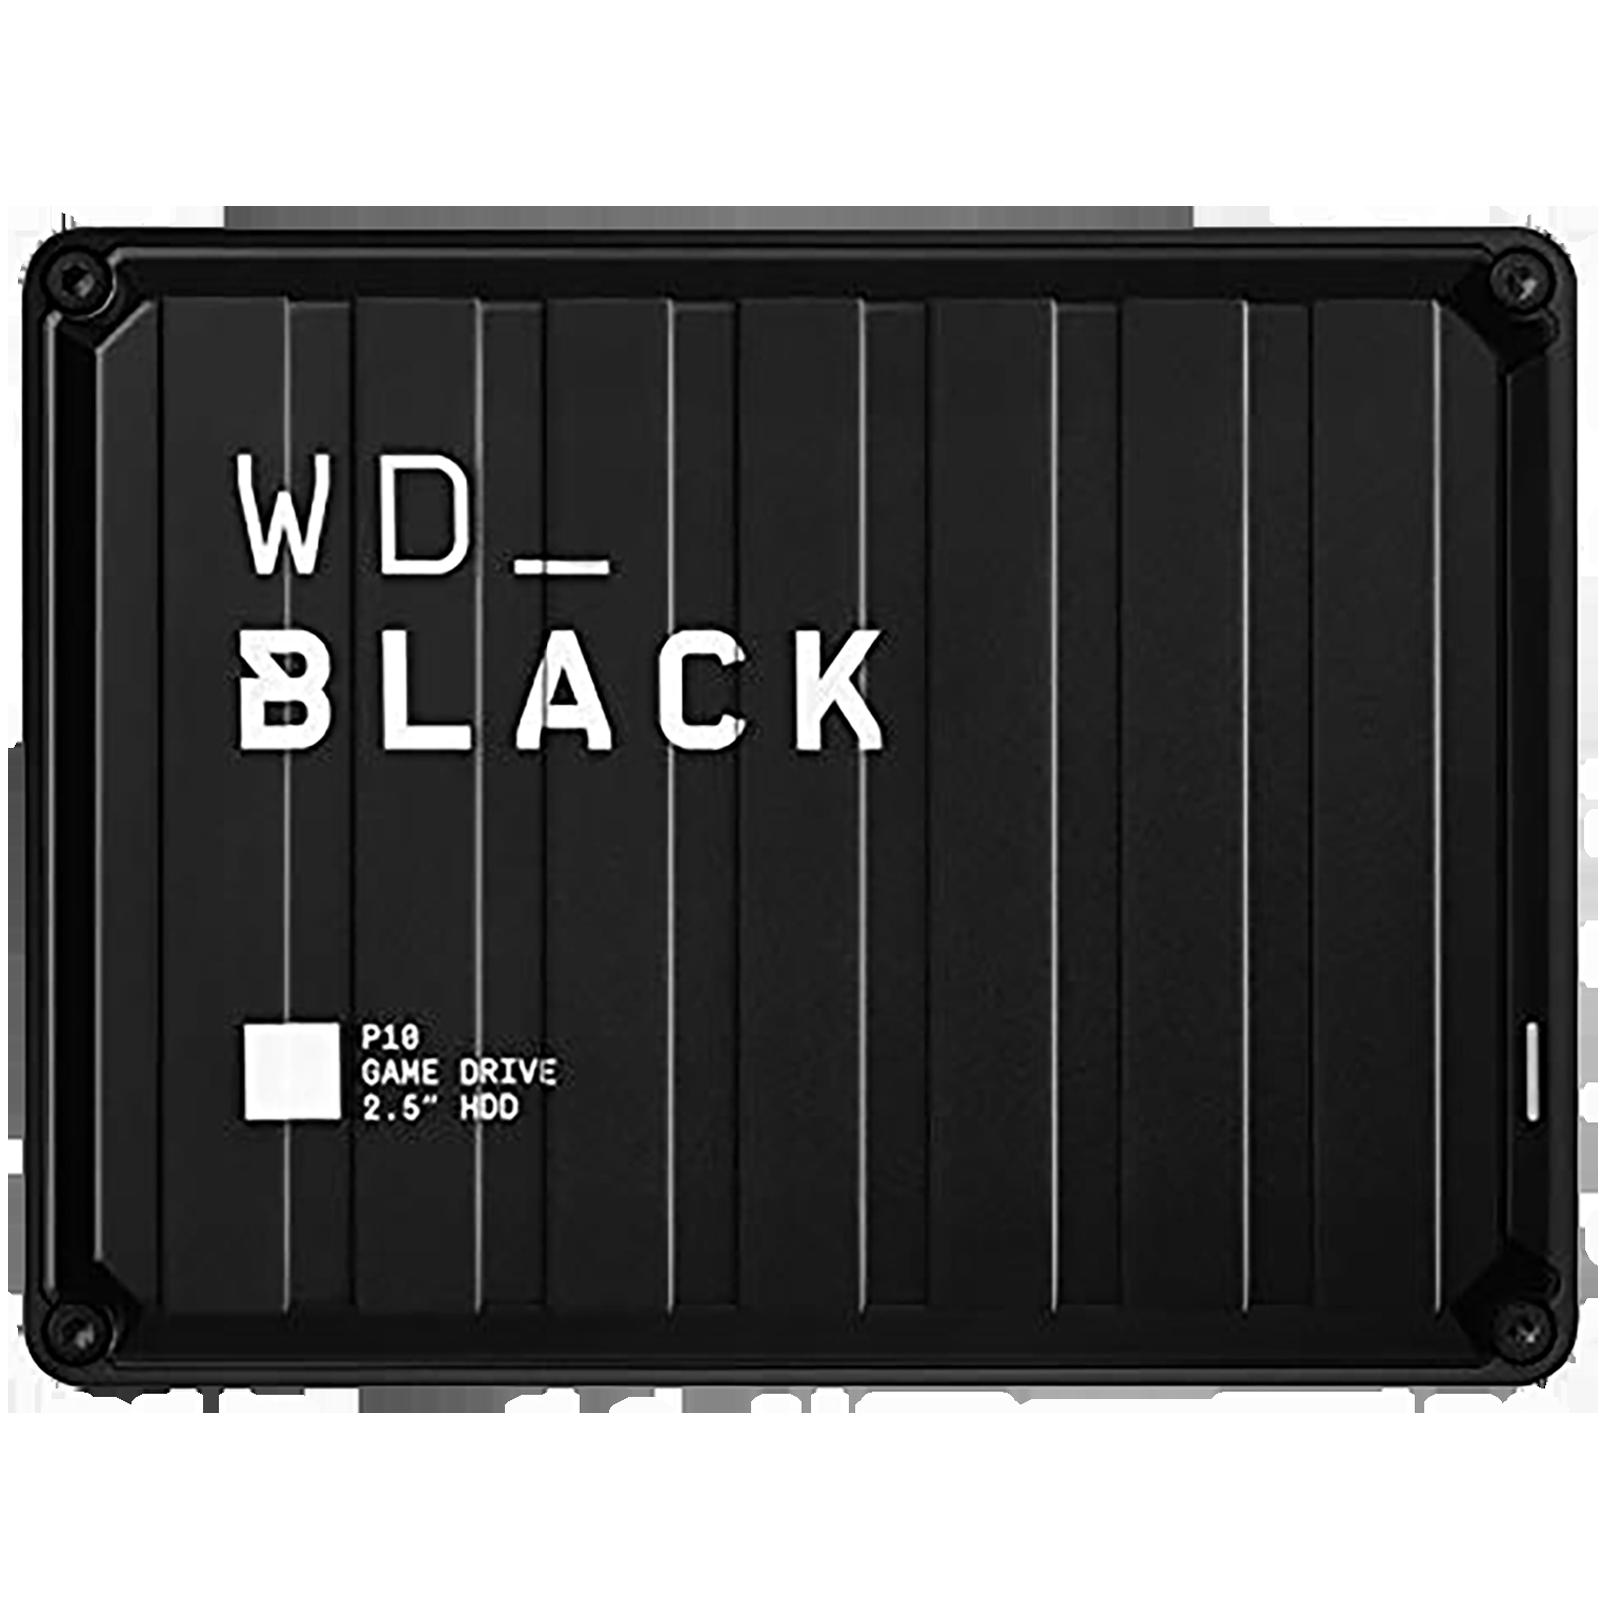 Western Digital WD_BLACK P10 2 TB USB 1.1 Game Drive (Purpose-Built For Gamers, WDBA2W0020BBK-WESN, Black)_1